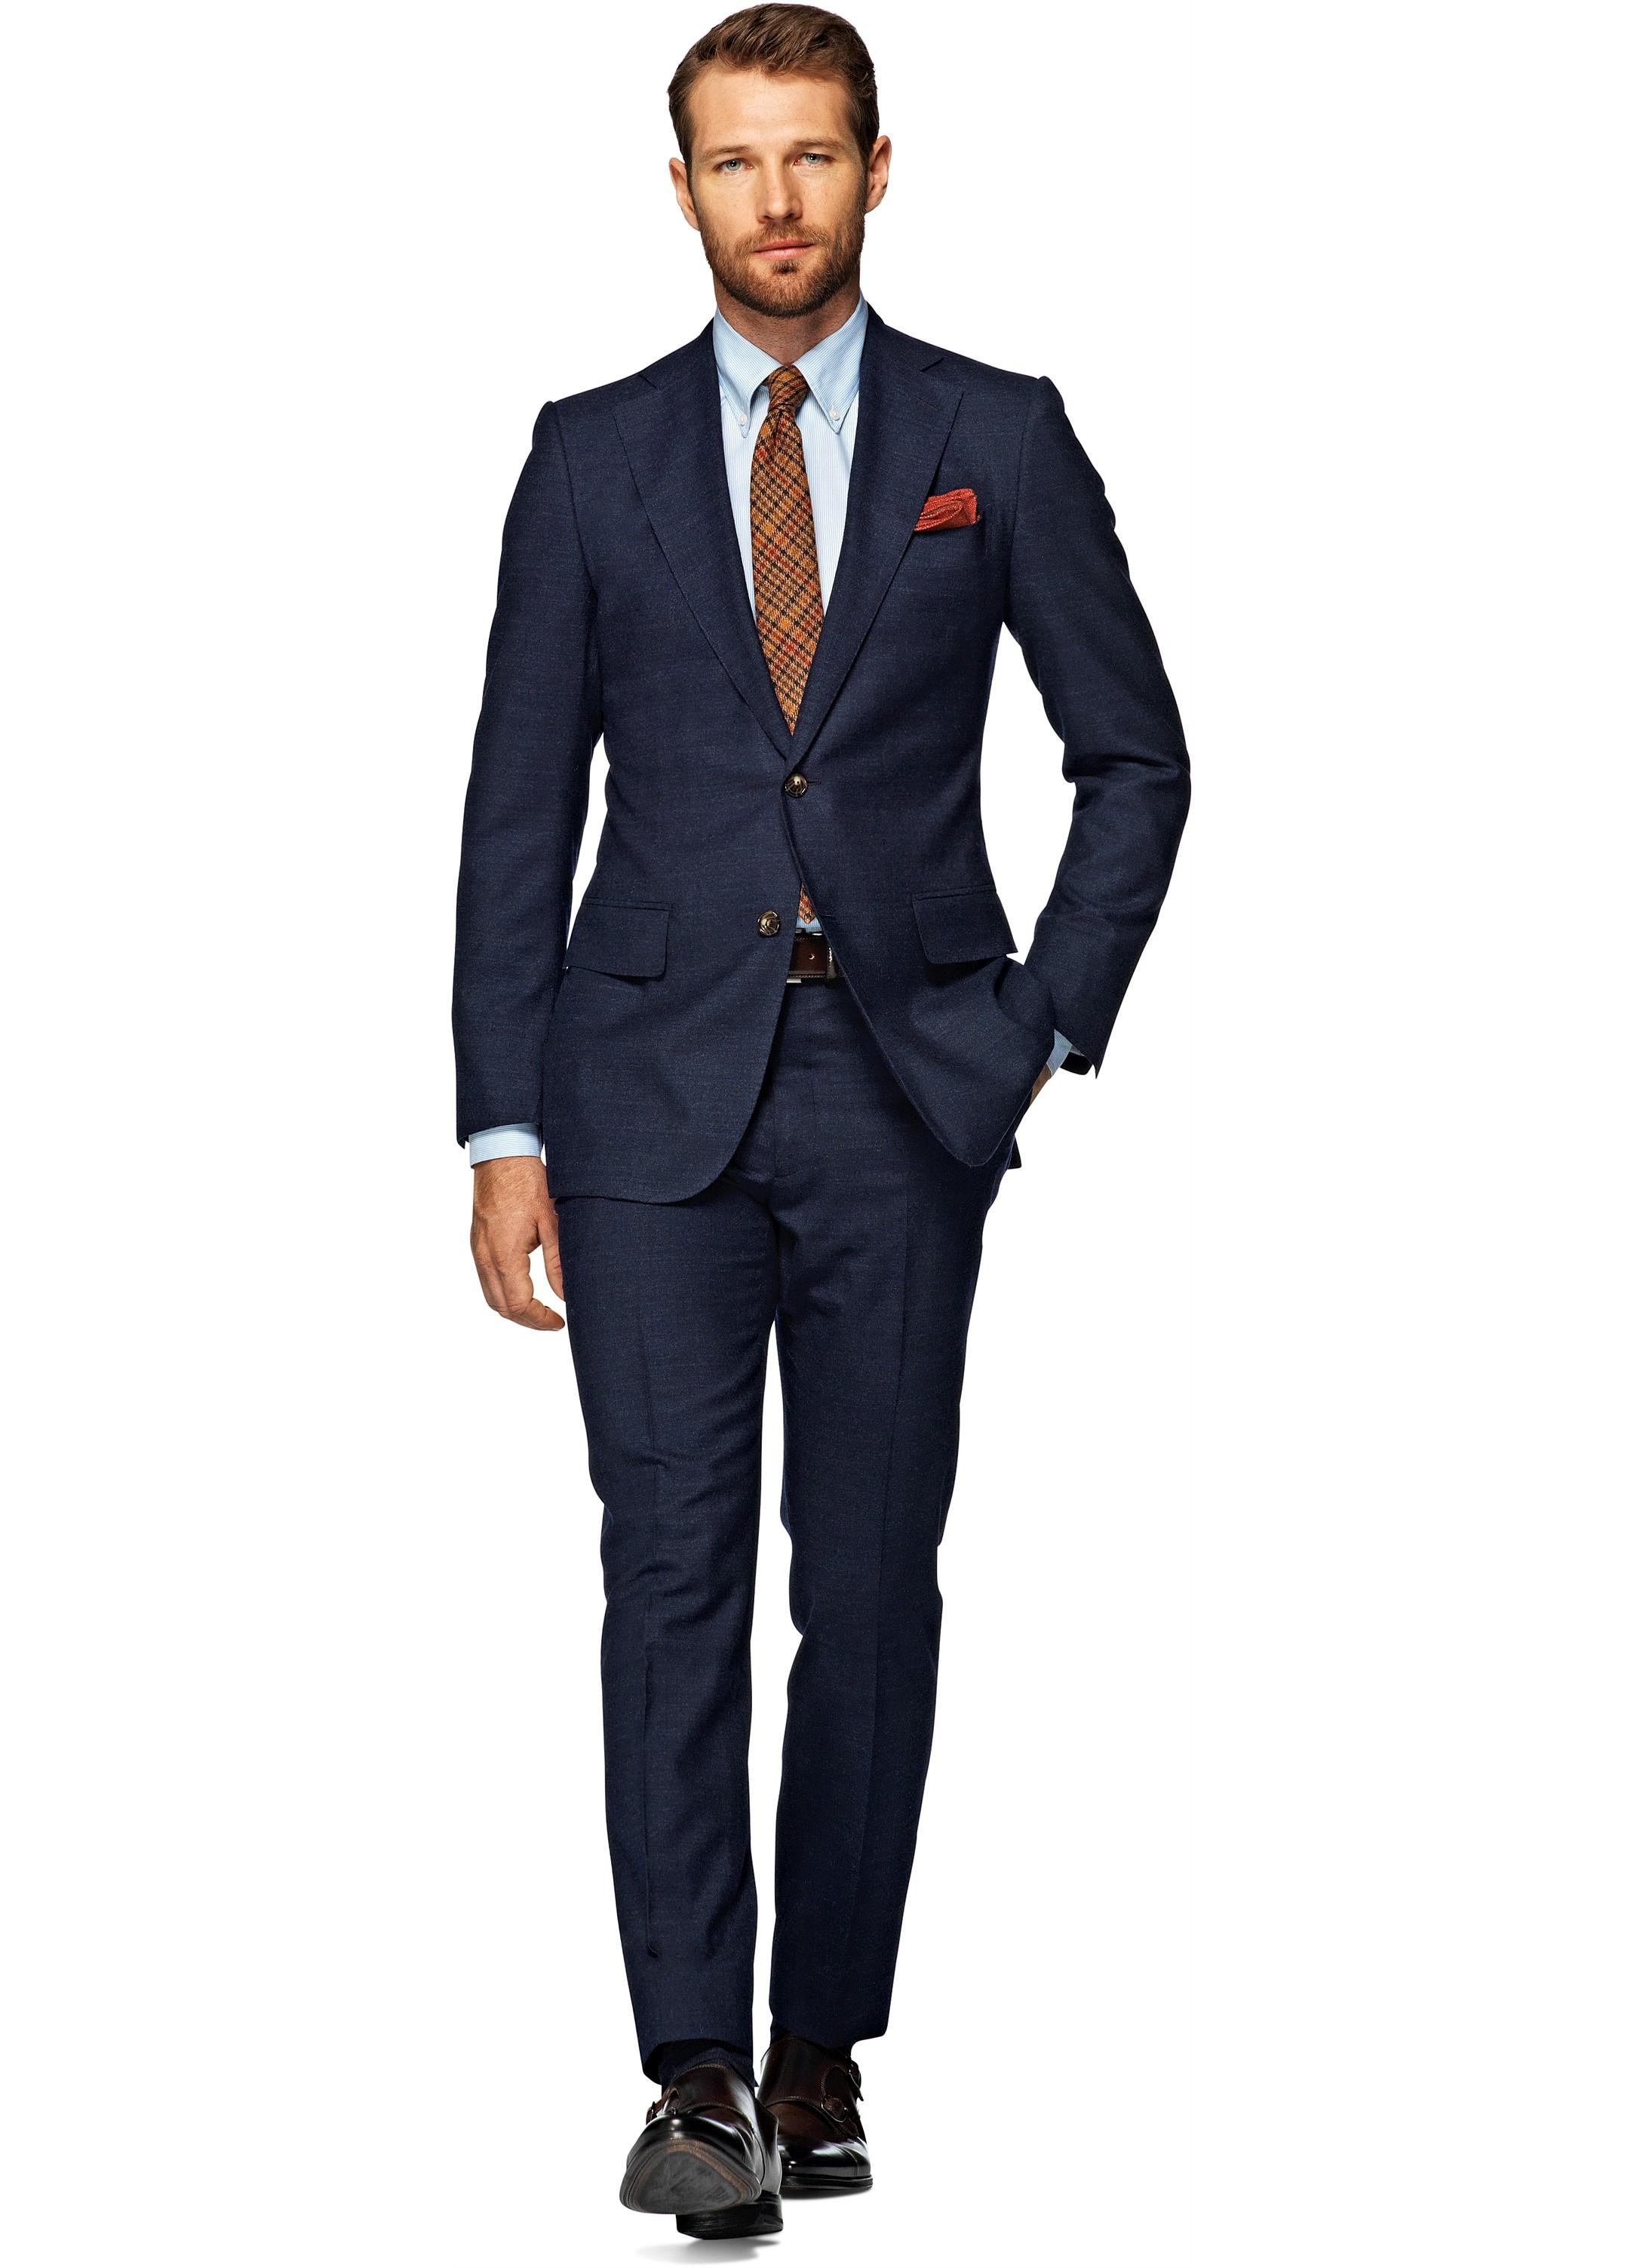 Anzug Blau Uni Lazio P3963 | Suitsupply Online Store